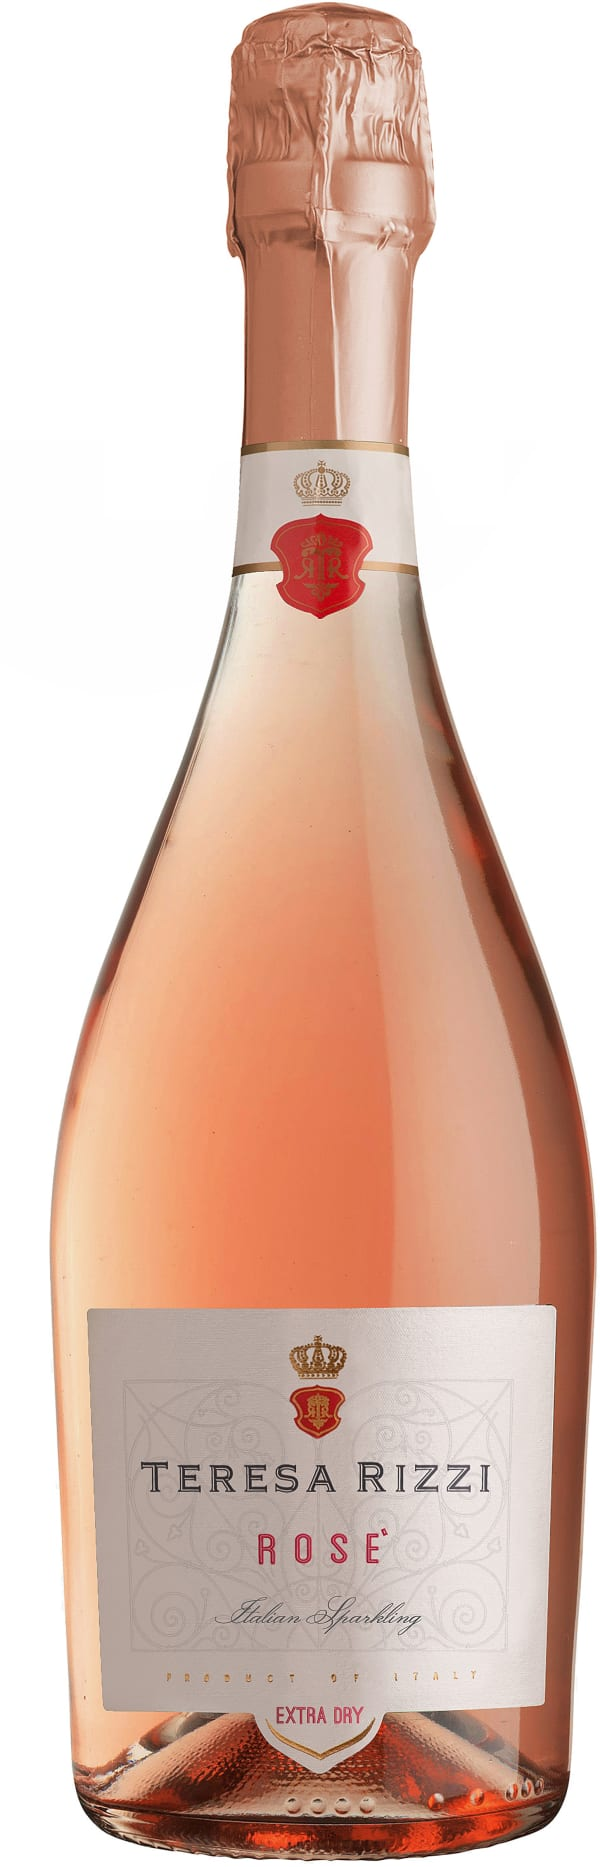 Teresa Rizzi Extra Dry Rosé